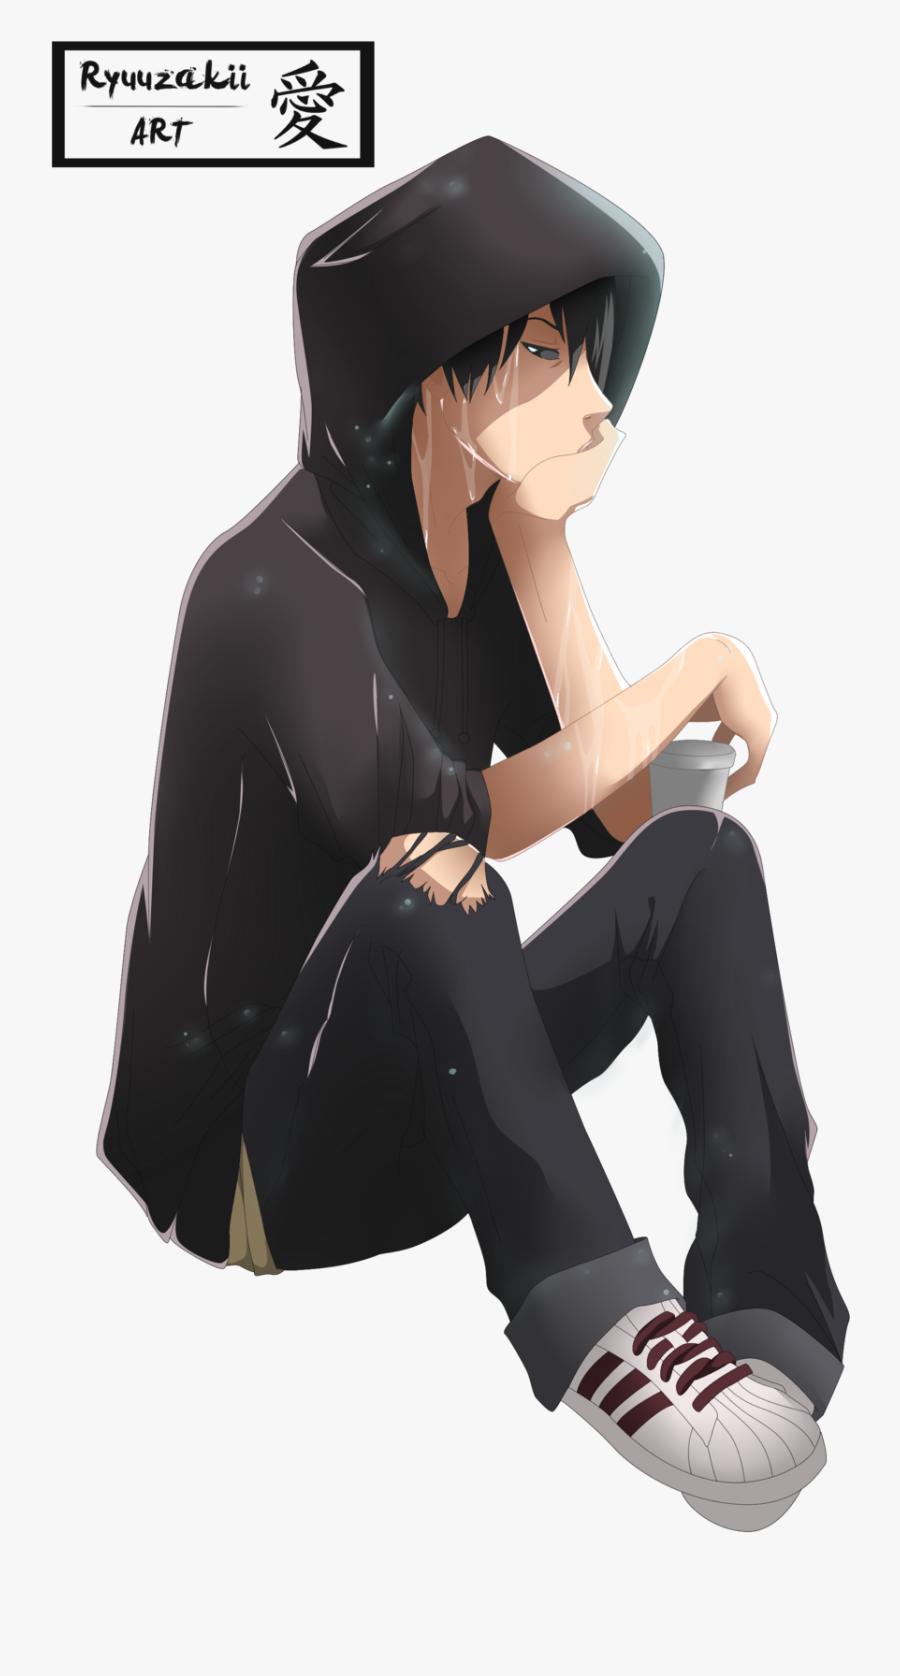 Sad Boy Png File - Sad Boy Cartoon Png, Transparent Clipart